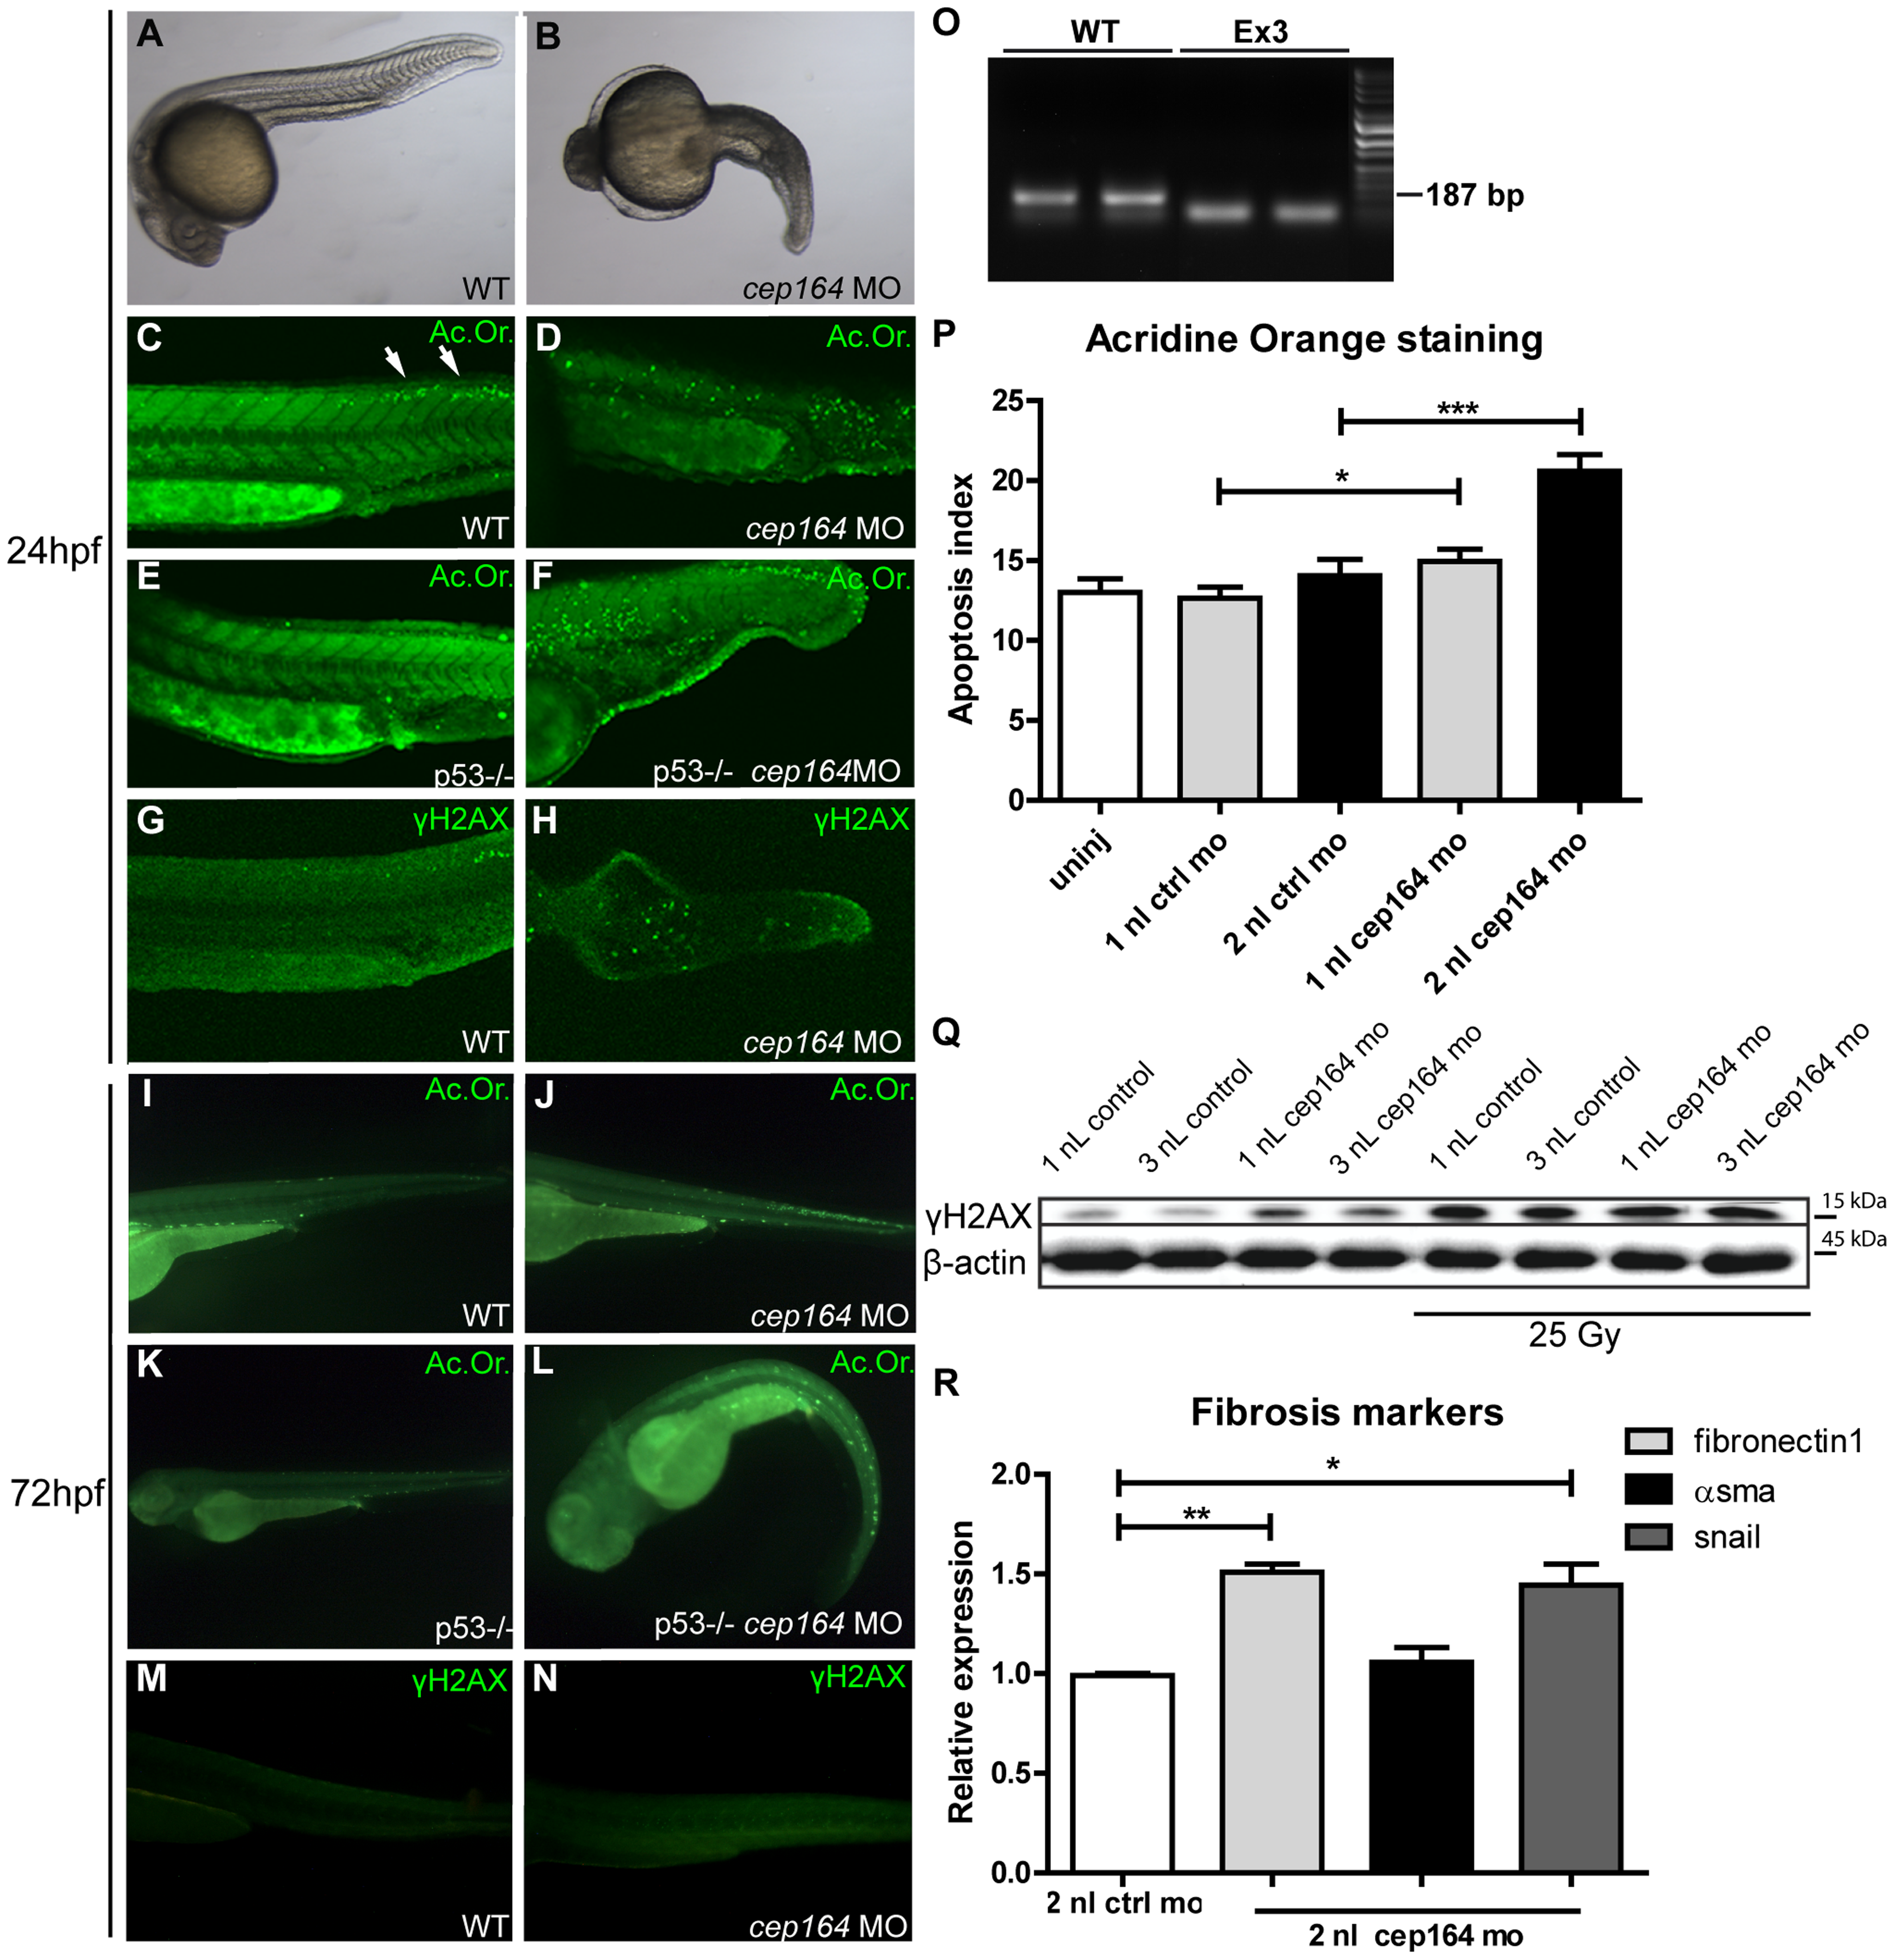 Apoptosis, DNA damage signaling and fibrosis in zebrafish.